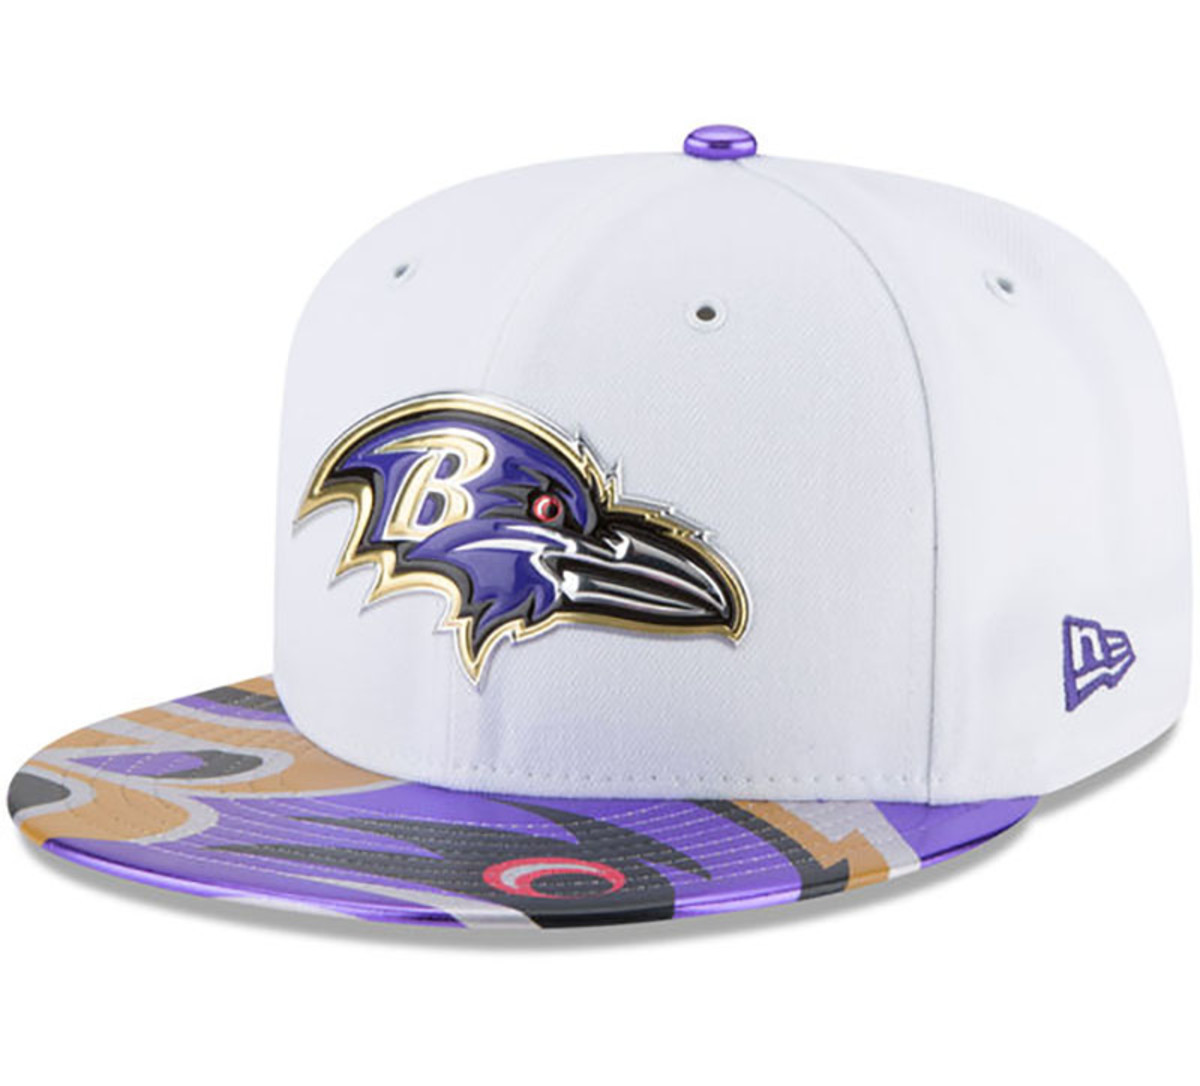 ravens-draft-hat-ranking.jpg